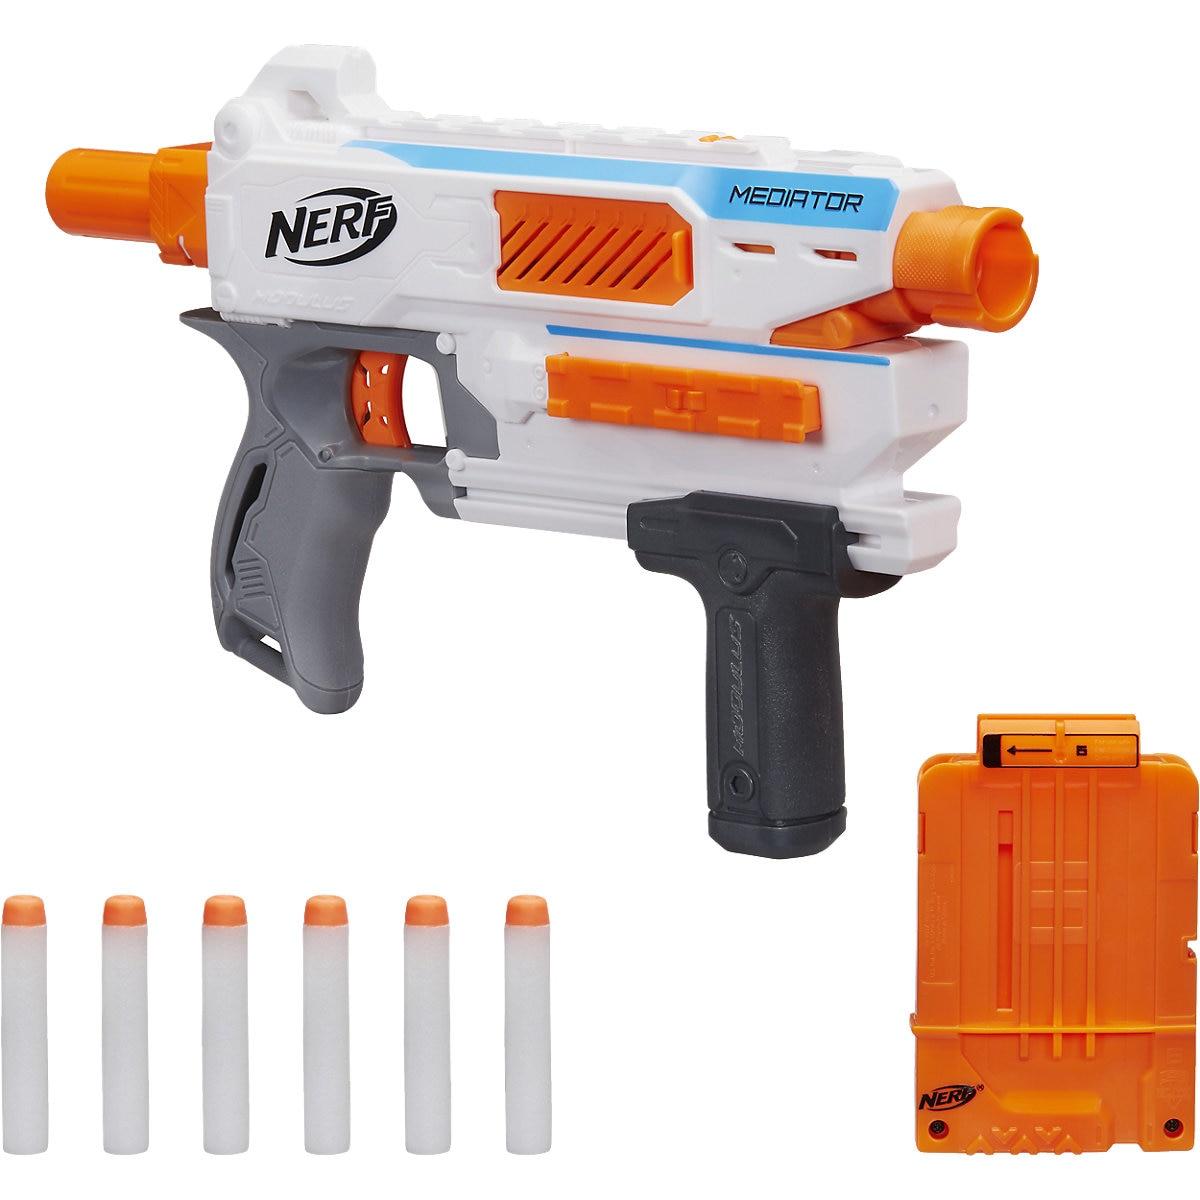 NERF jouet pistolets 7196314 pistolet arme jouets jeux pneumatique blaster garçon orbiz revolver plein air plaisir sport MTpromo